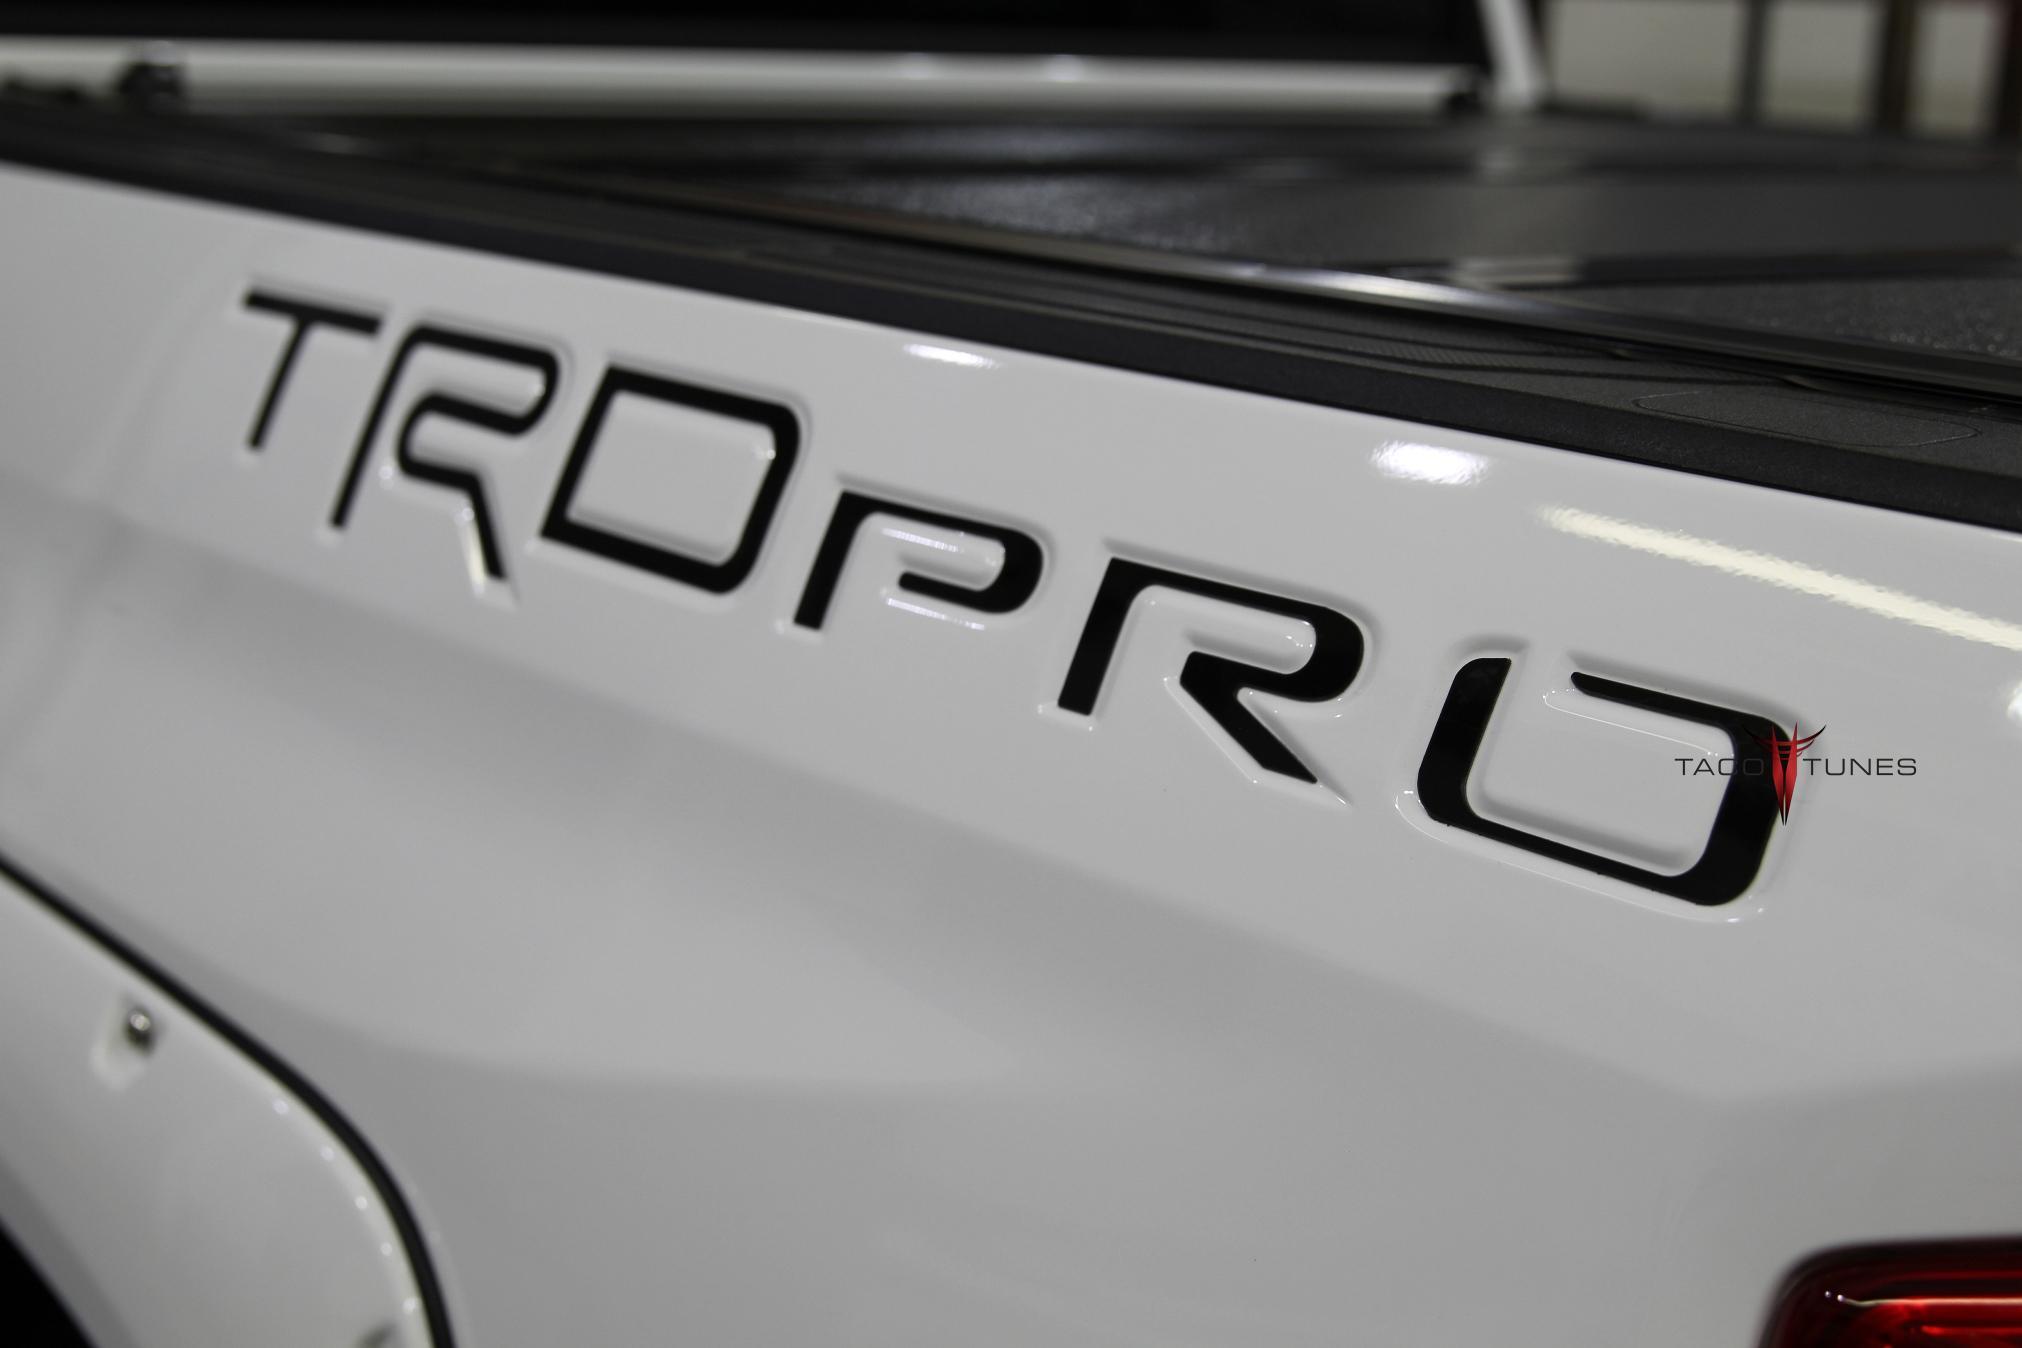 Brian's System 2016 Toyota Tundra CrewMax TRD Pro System 1B audio